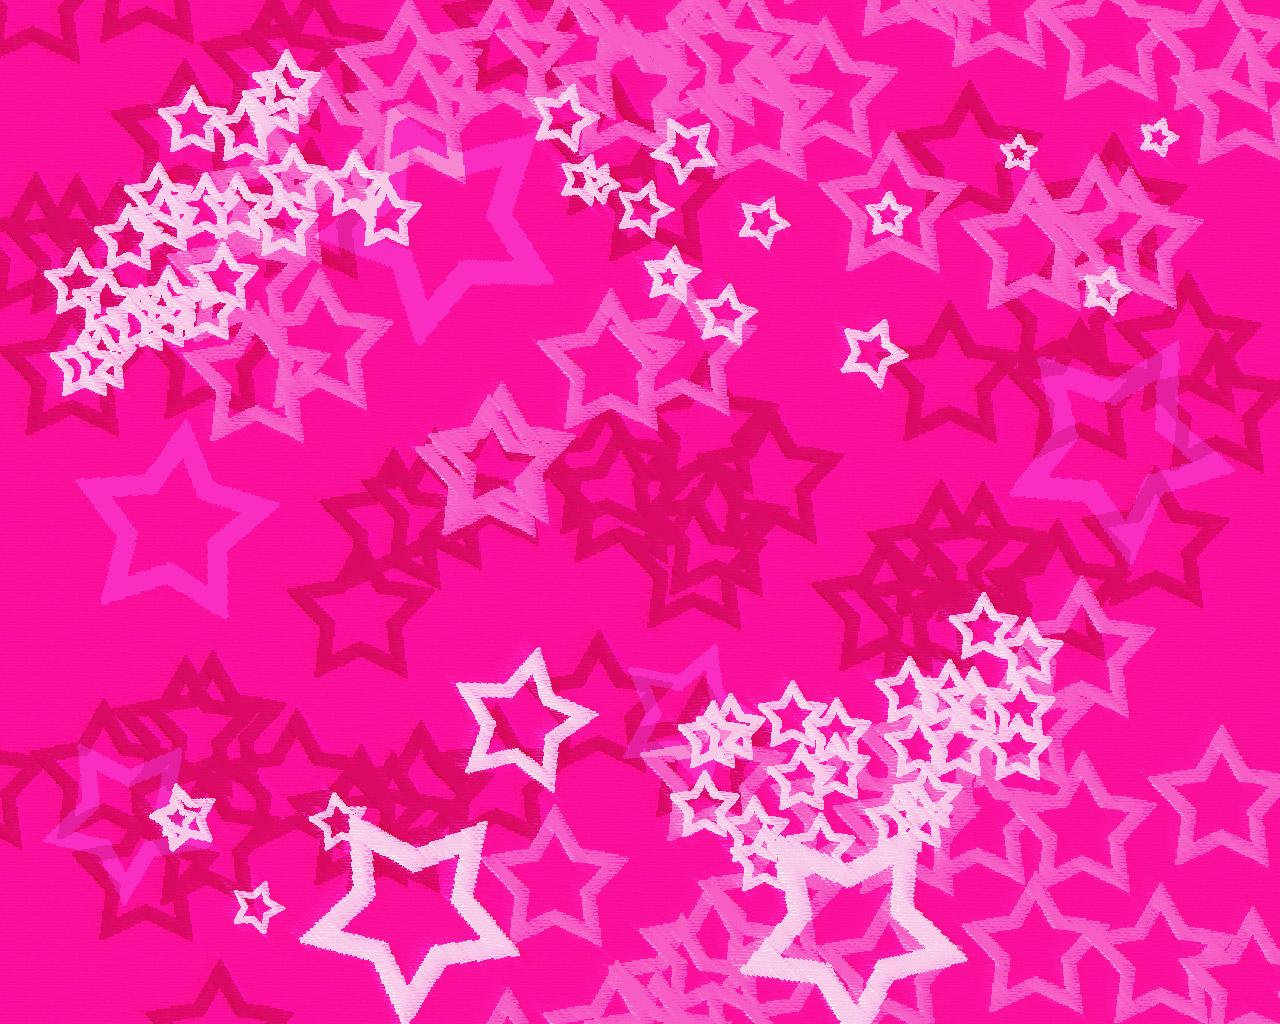 Wallpapers For Cute Pink Desktop Wallpaper Wallpapers For 1280x1024